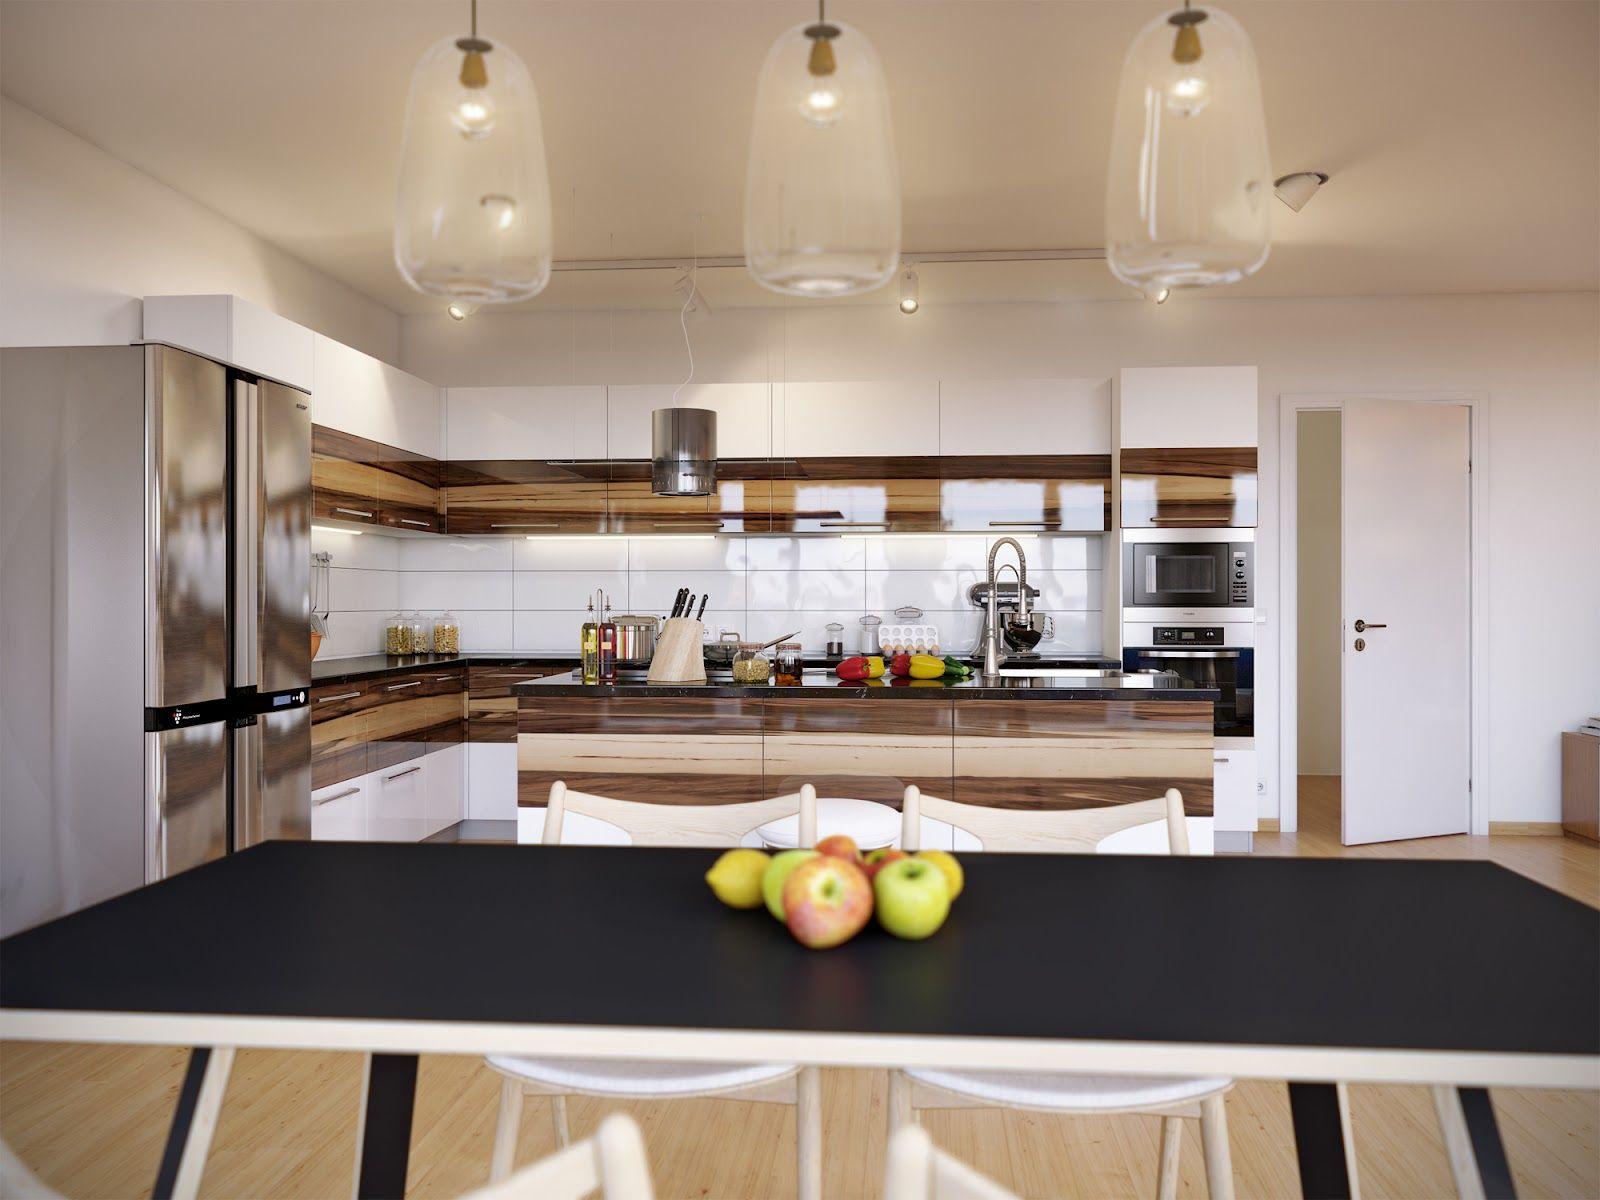 Gorgeous Modern And Chic Kitchen Design And Color Scheme Home Best Kitchen Unit Designs Design Ideas